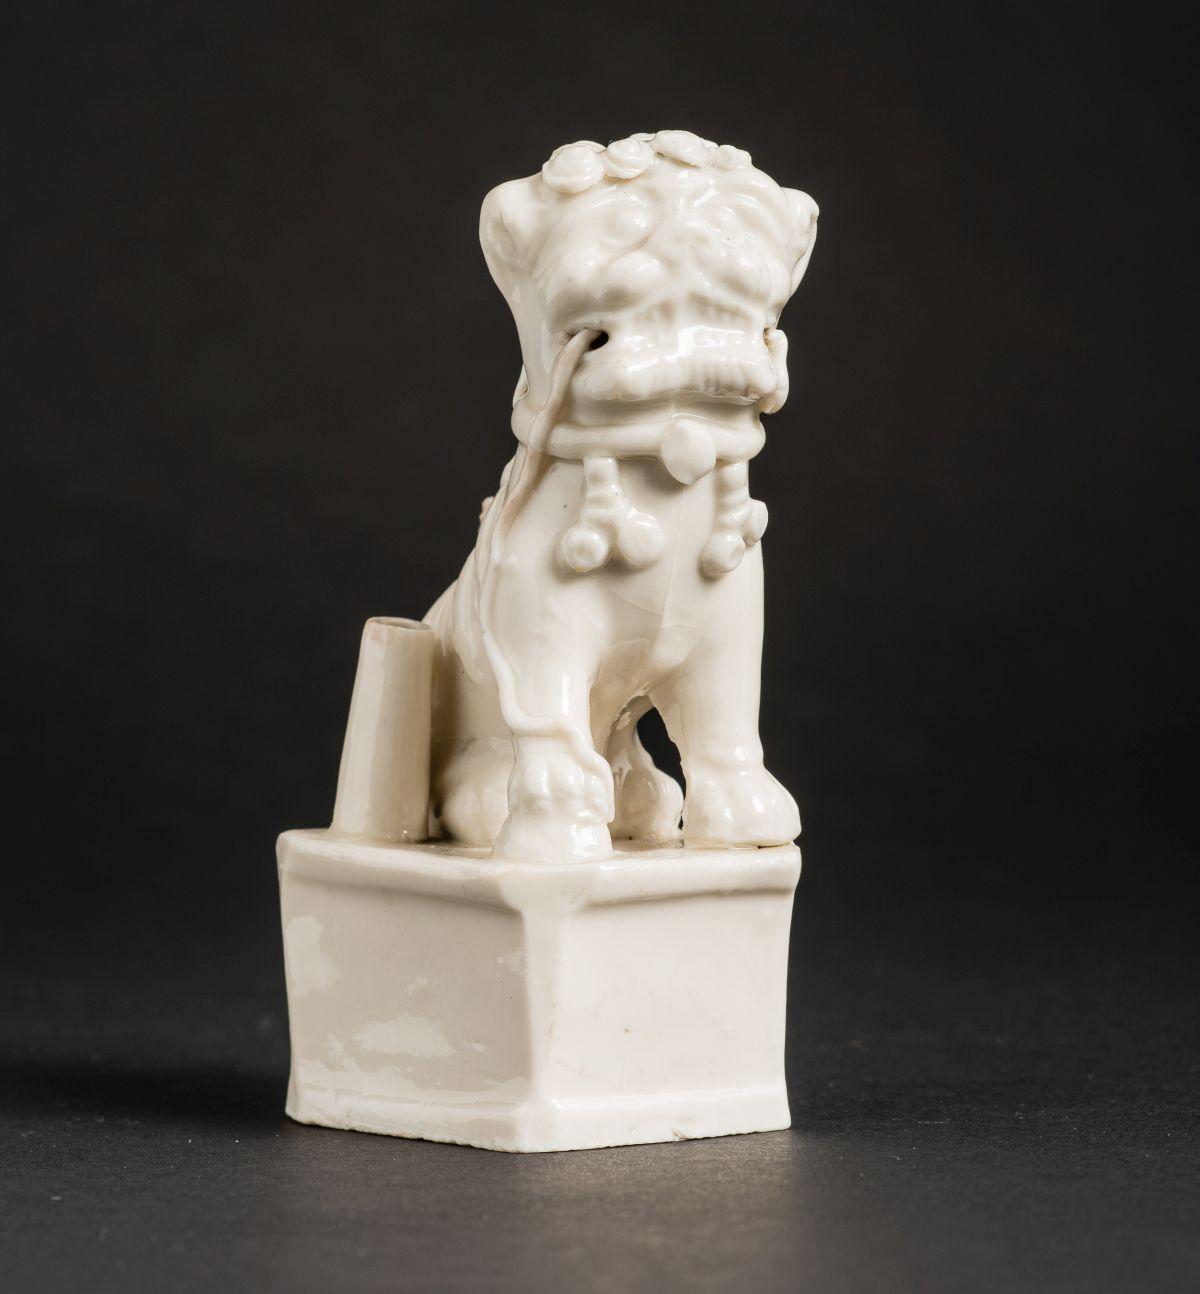 #201 Guardian lion (fo-lion) on Pedestal | Wächterlöwe (Fo-Löwe) auf Sockel Image